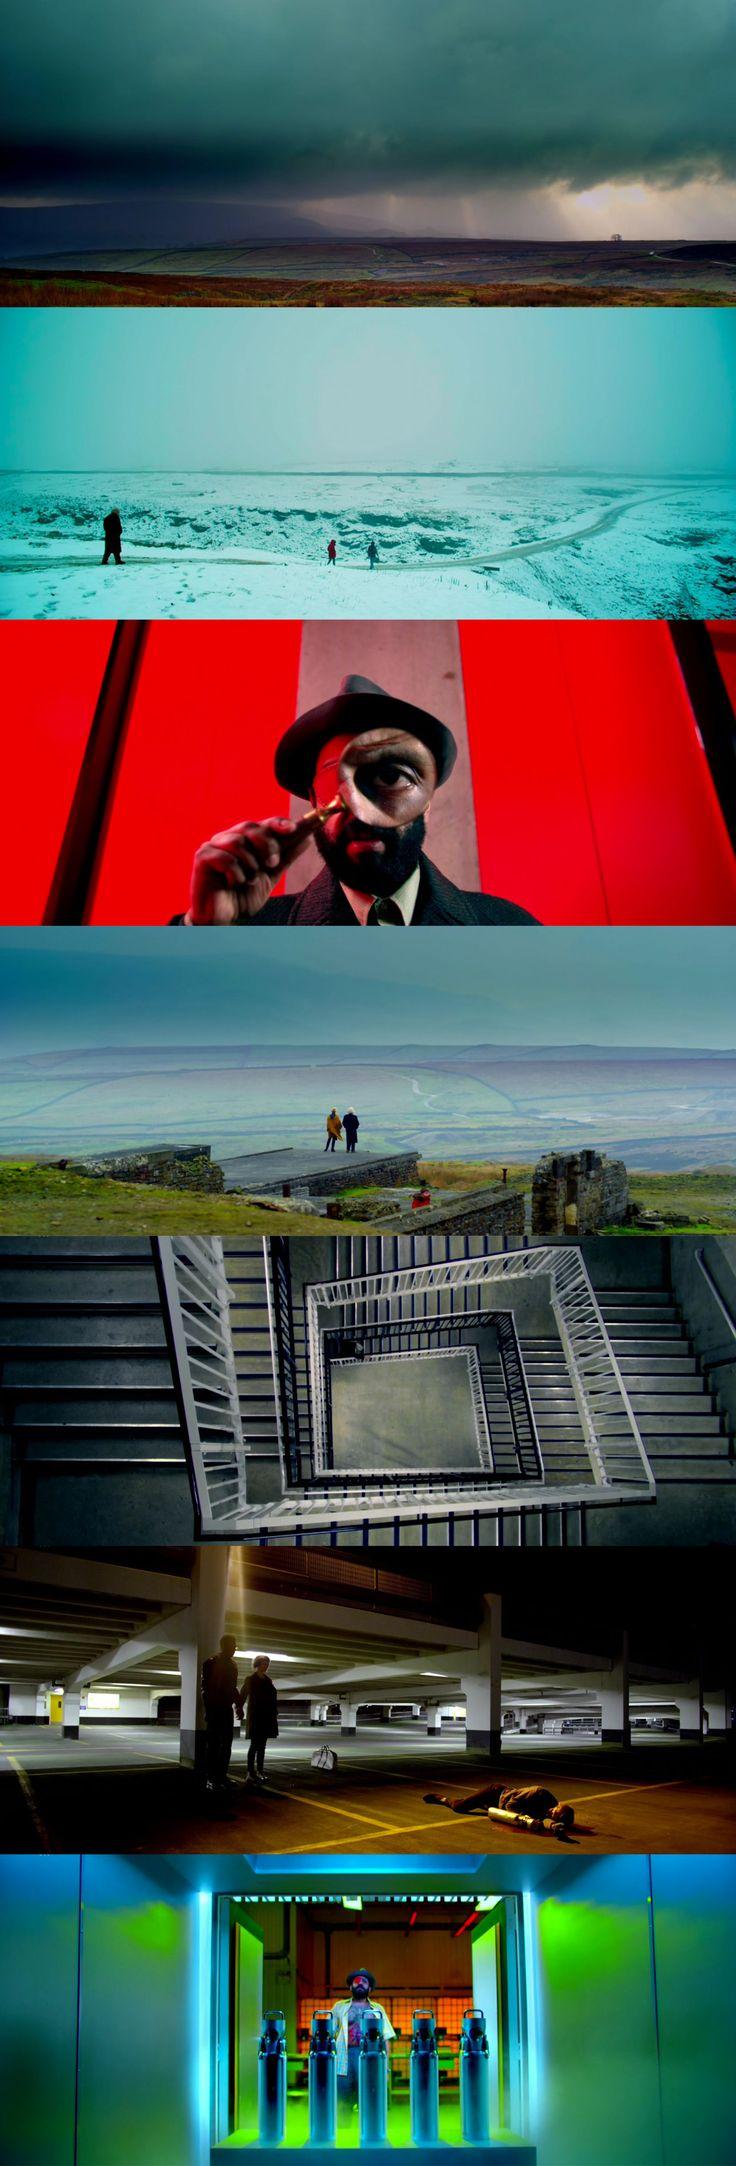 Utopia (TV) S02E05-06 - Cinematography by Ole Bratt Birkeland | Directed by Dennis Kelly